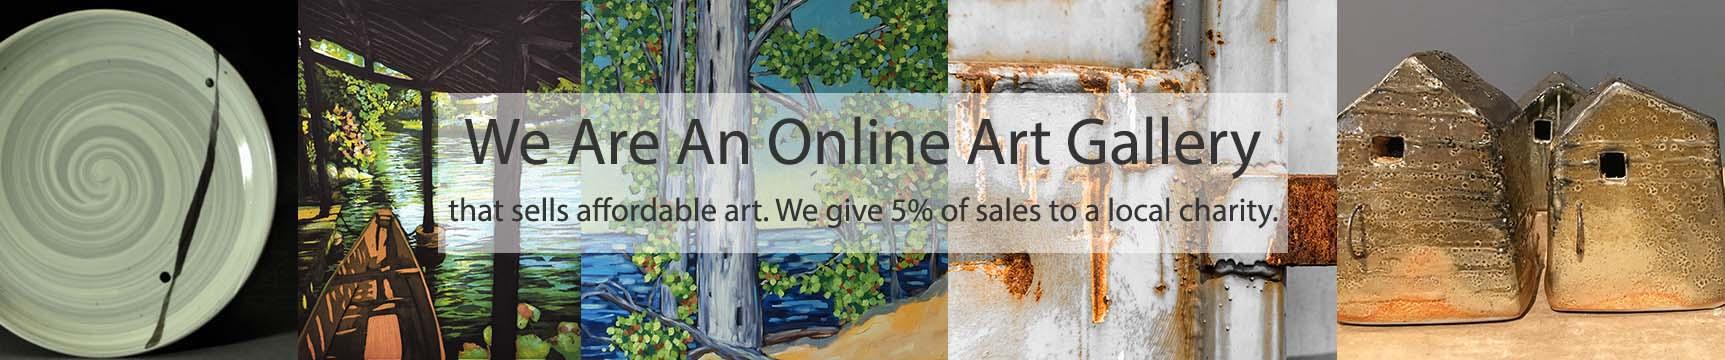 C2C Gallery Is A Unique Online Art Gallery